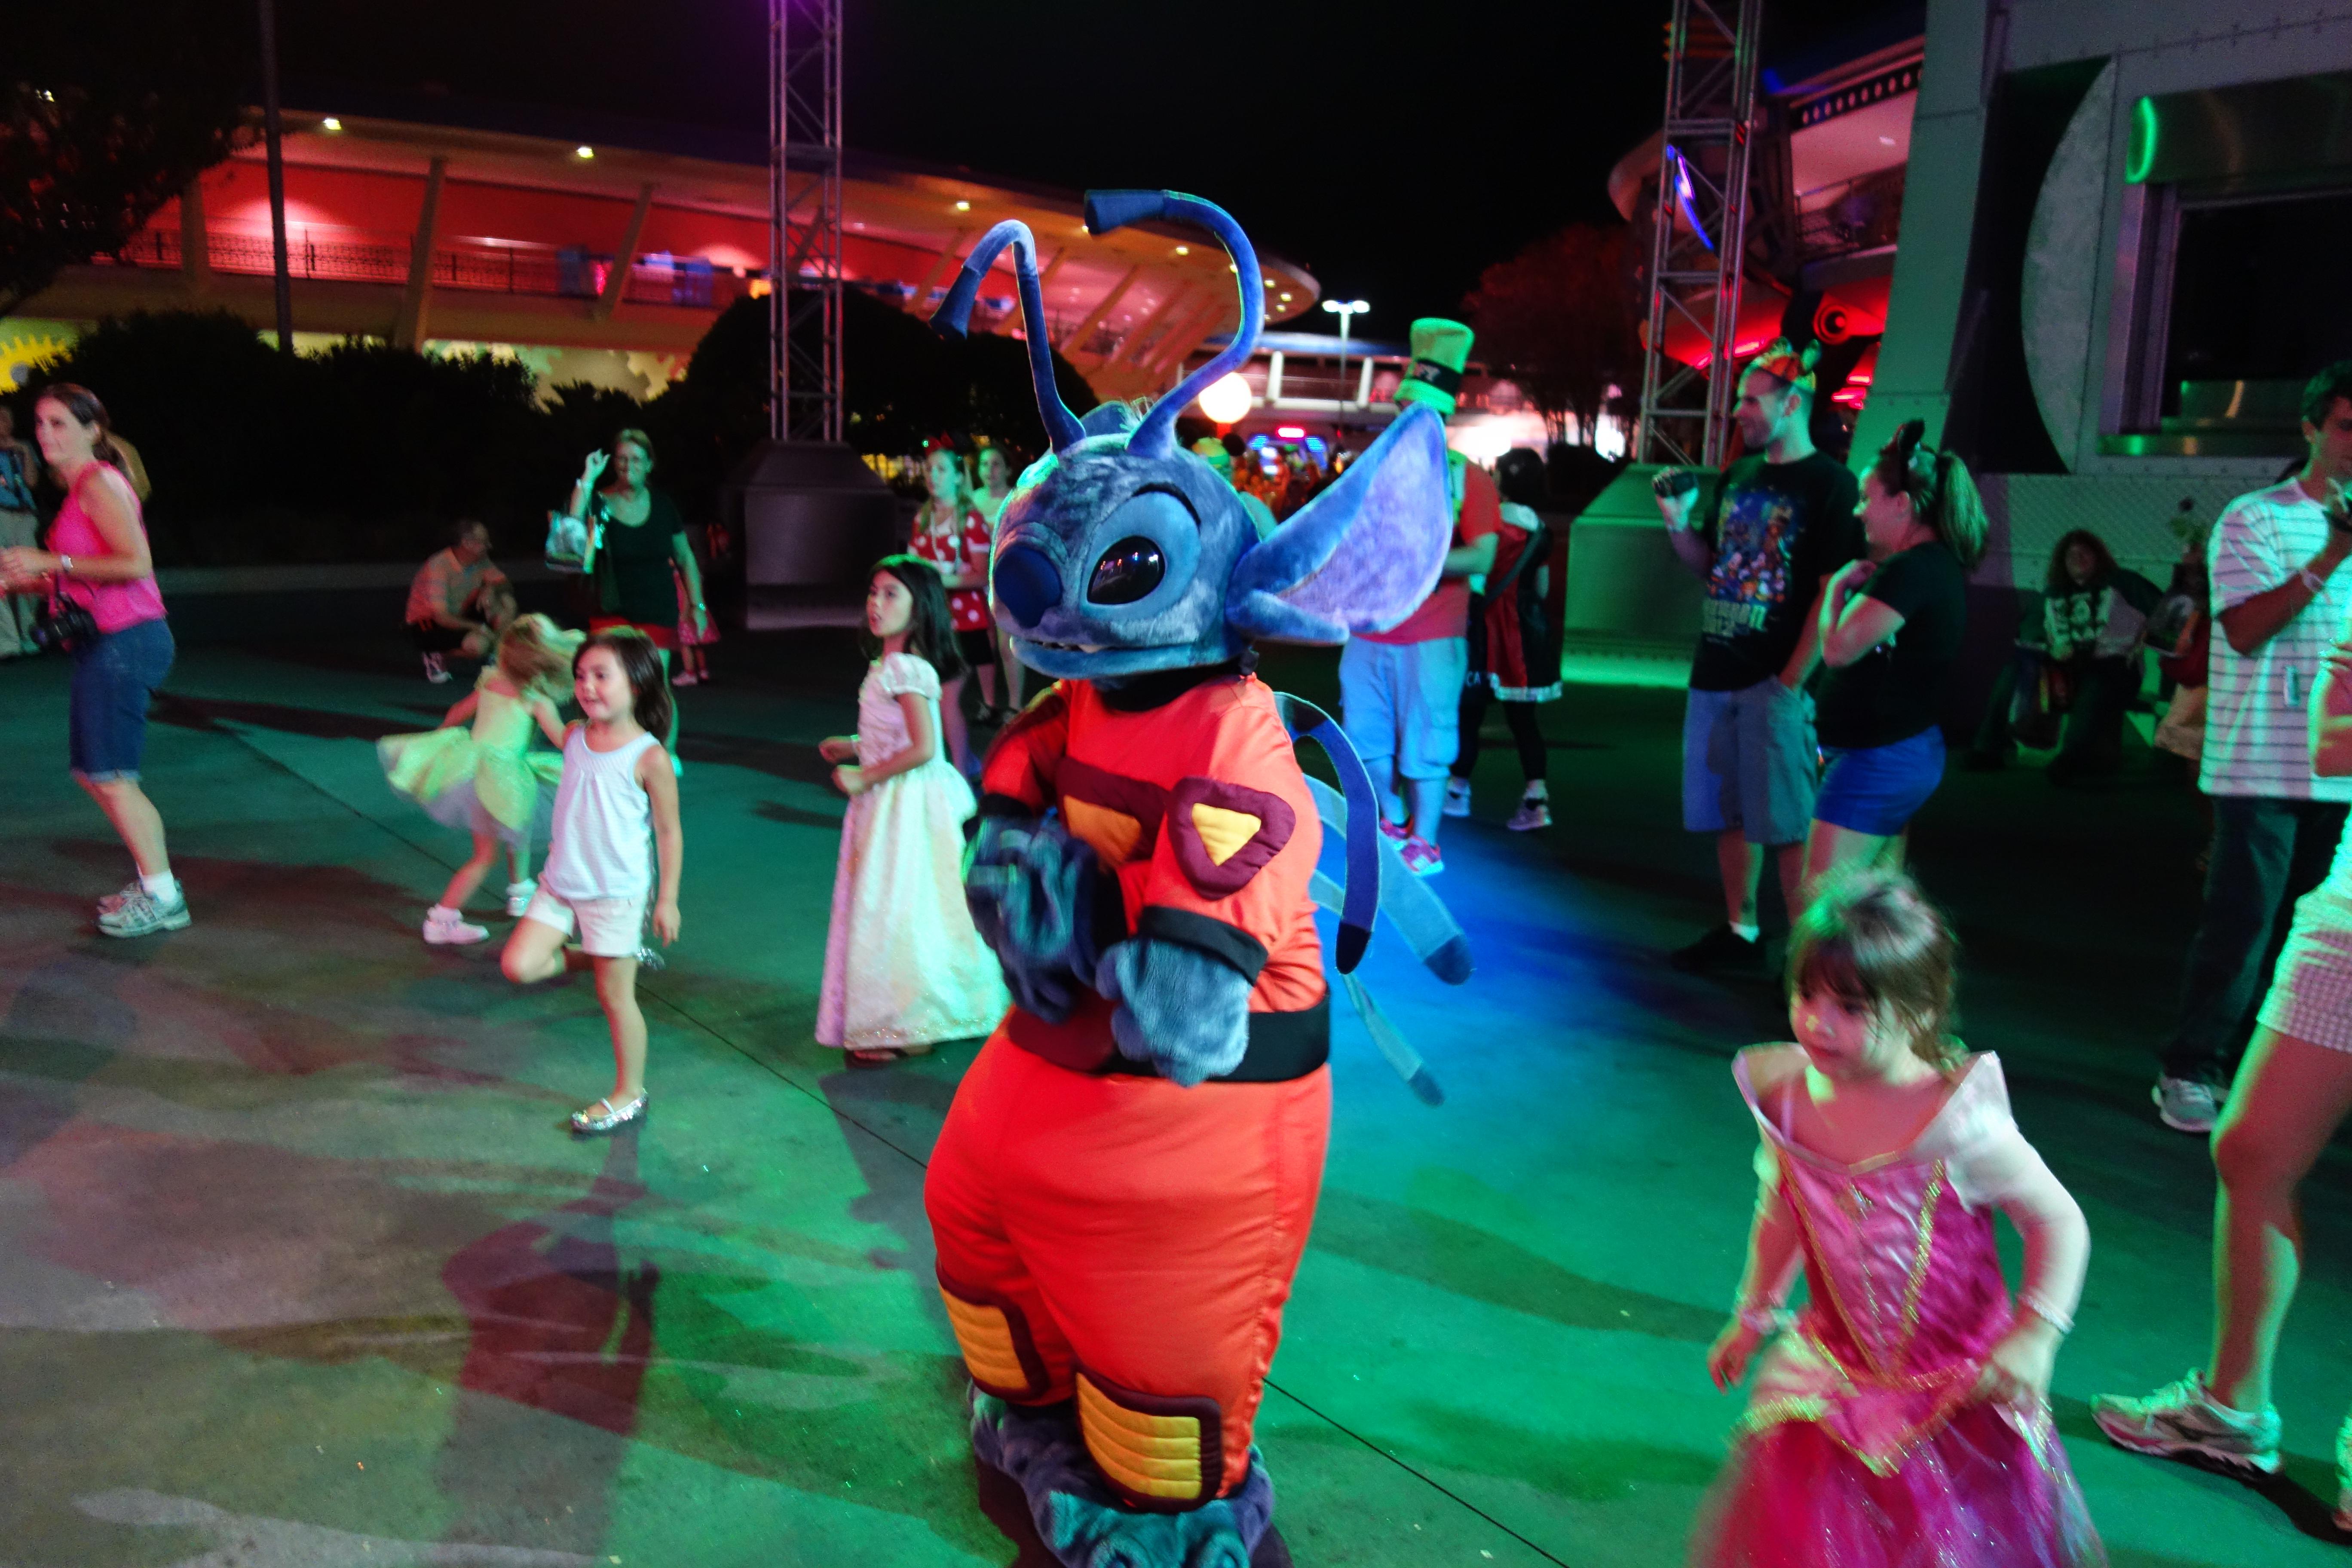 Stitch Kennythepirates Unofficial Guide To Disney World